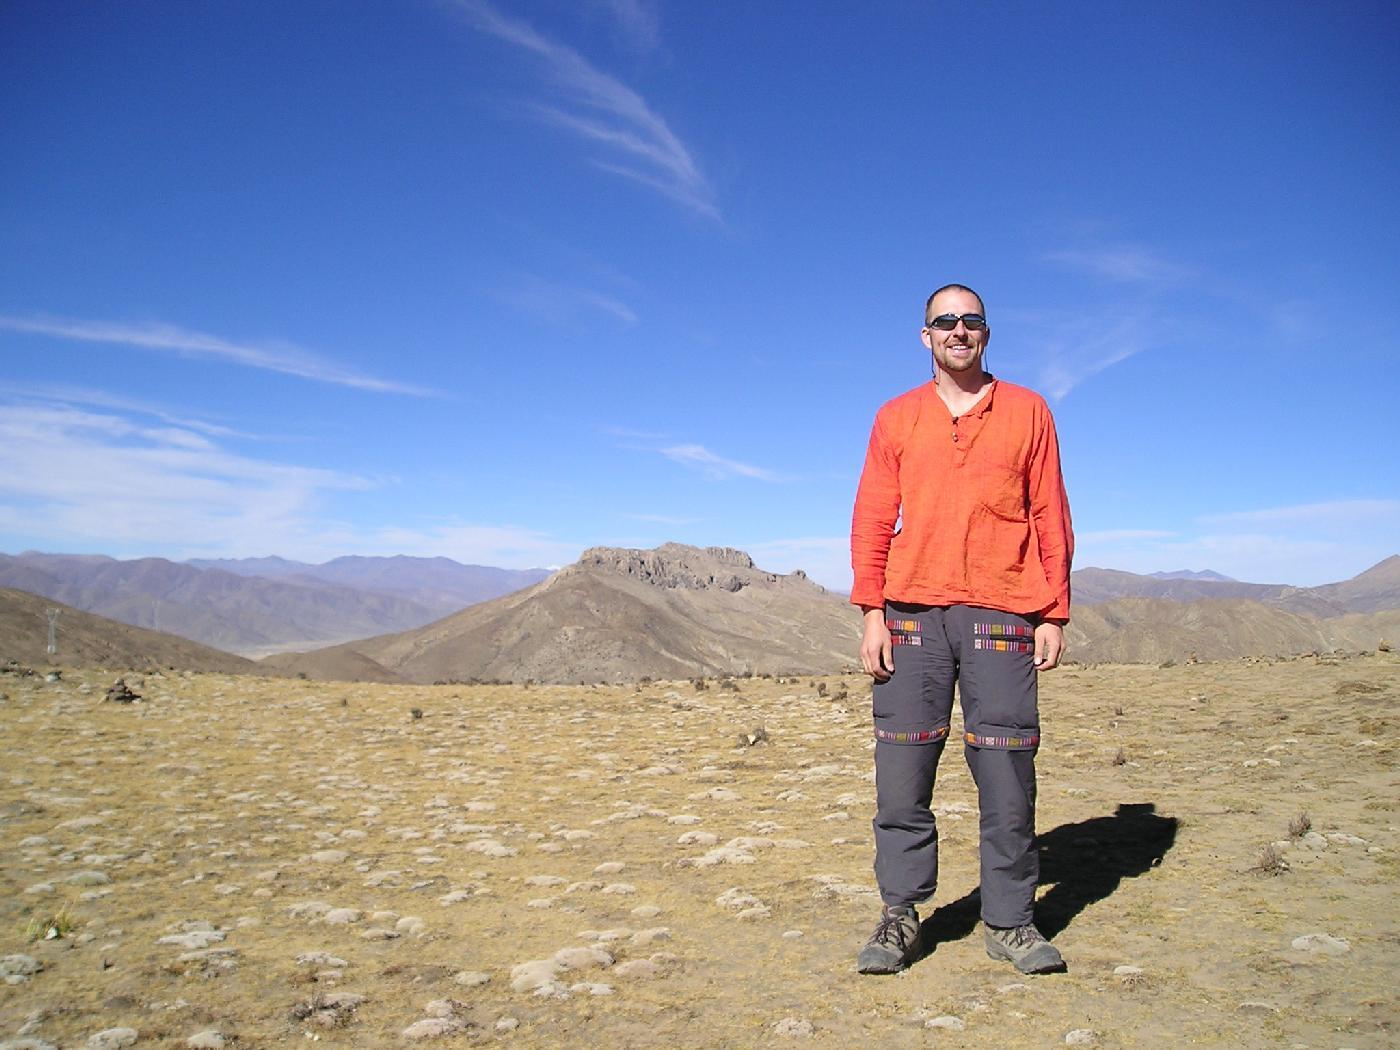 Dave Asprey - Victoria, British Columbia, Canada | about me